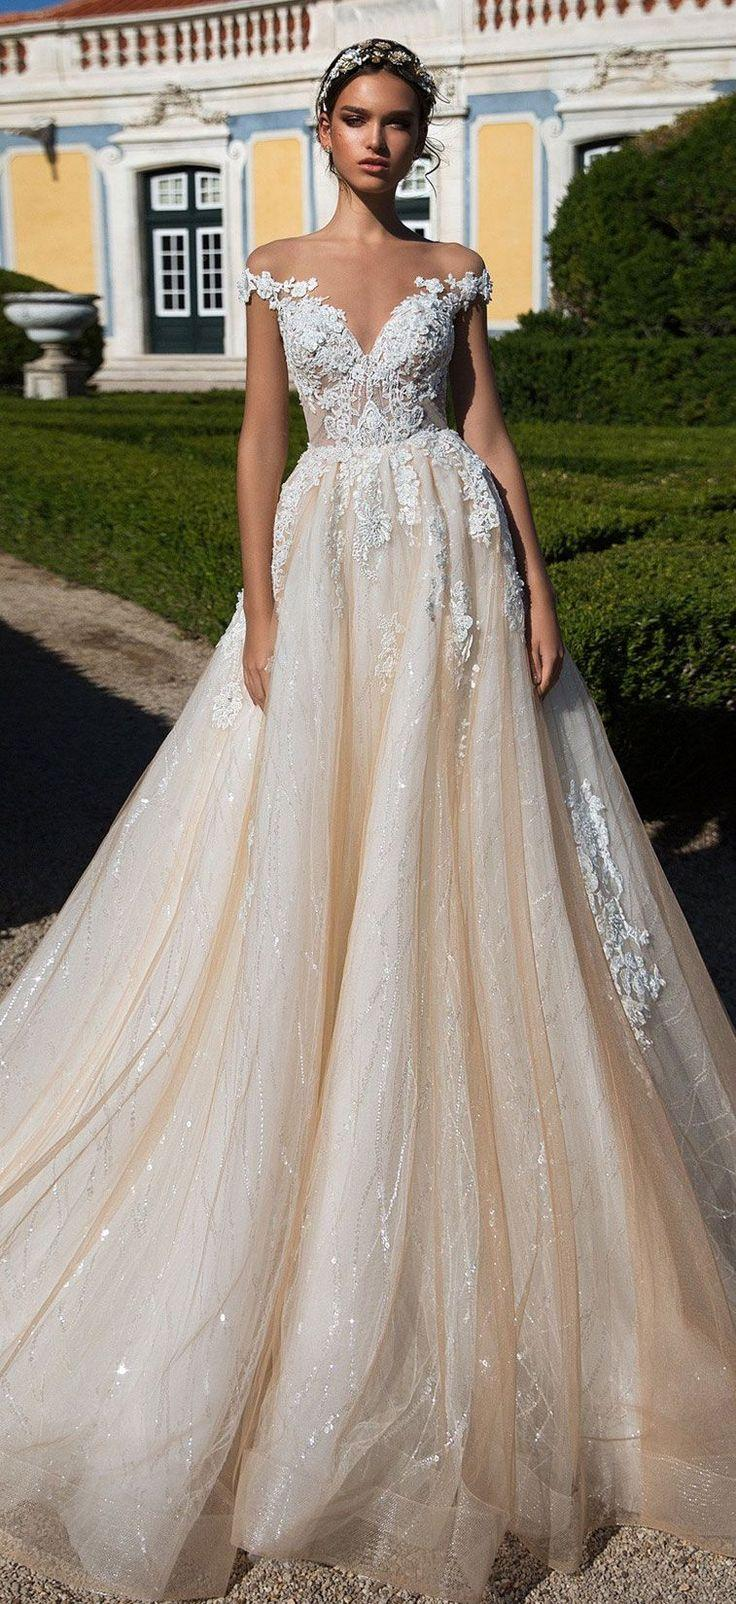 69d6cbee2c Dress - Milla Nova Wedding Dress Inspiration  2825346 - Weddbook